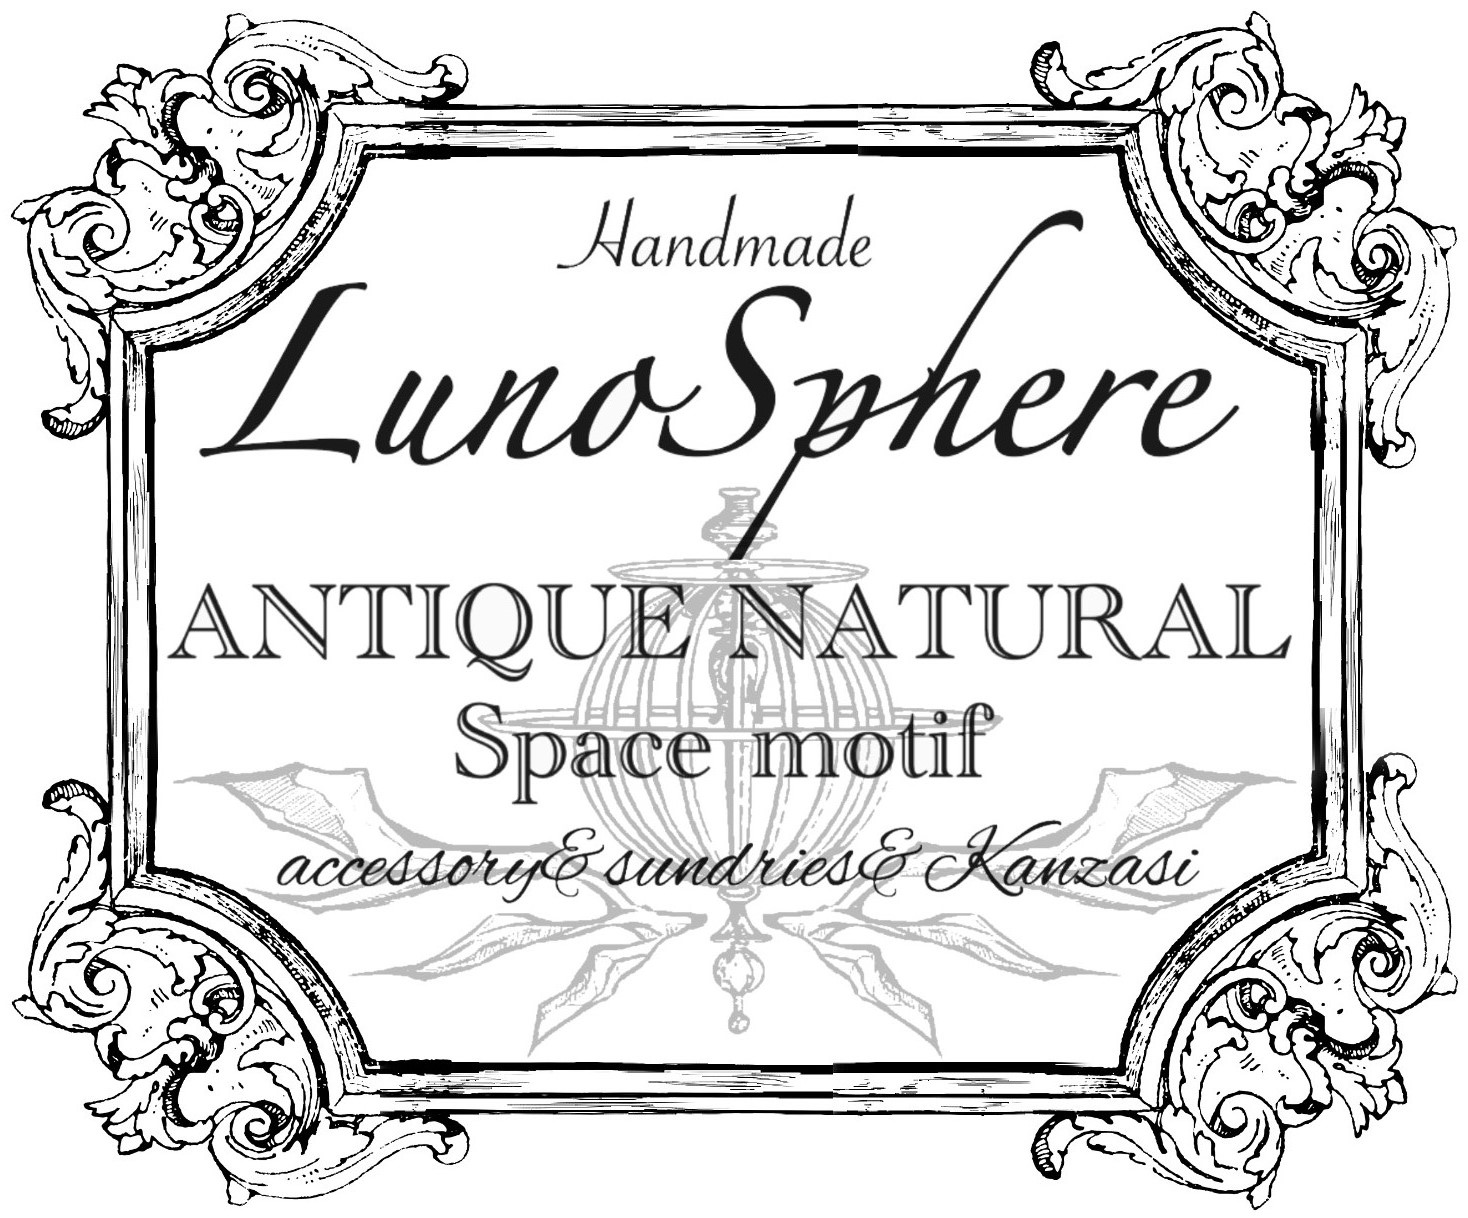 LunoSphere 寺西やなぎの画像